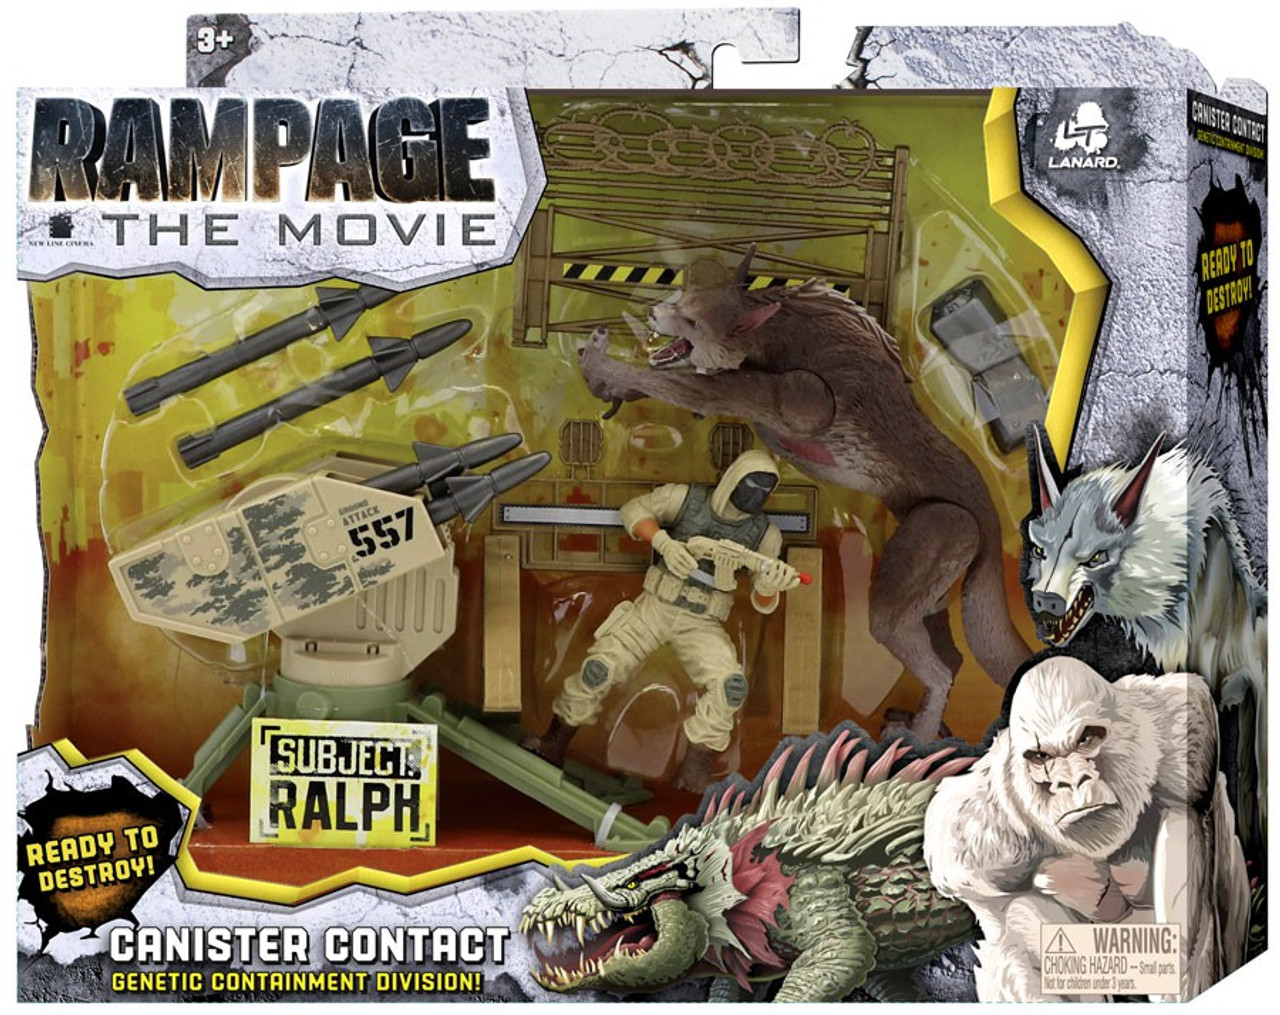 Ralph Set action Toy Figure The Rock Movie Rampage Big City Brawl Kids Gift